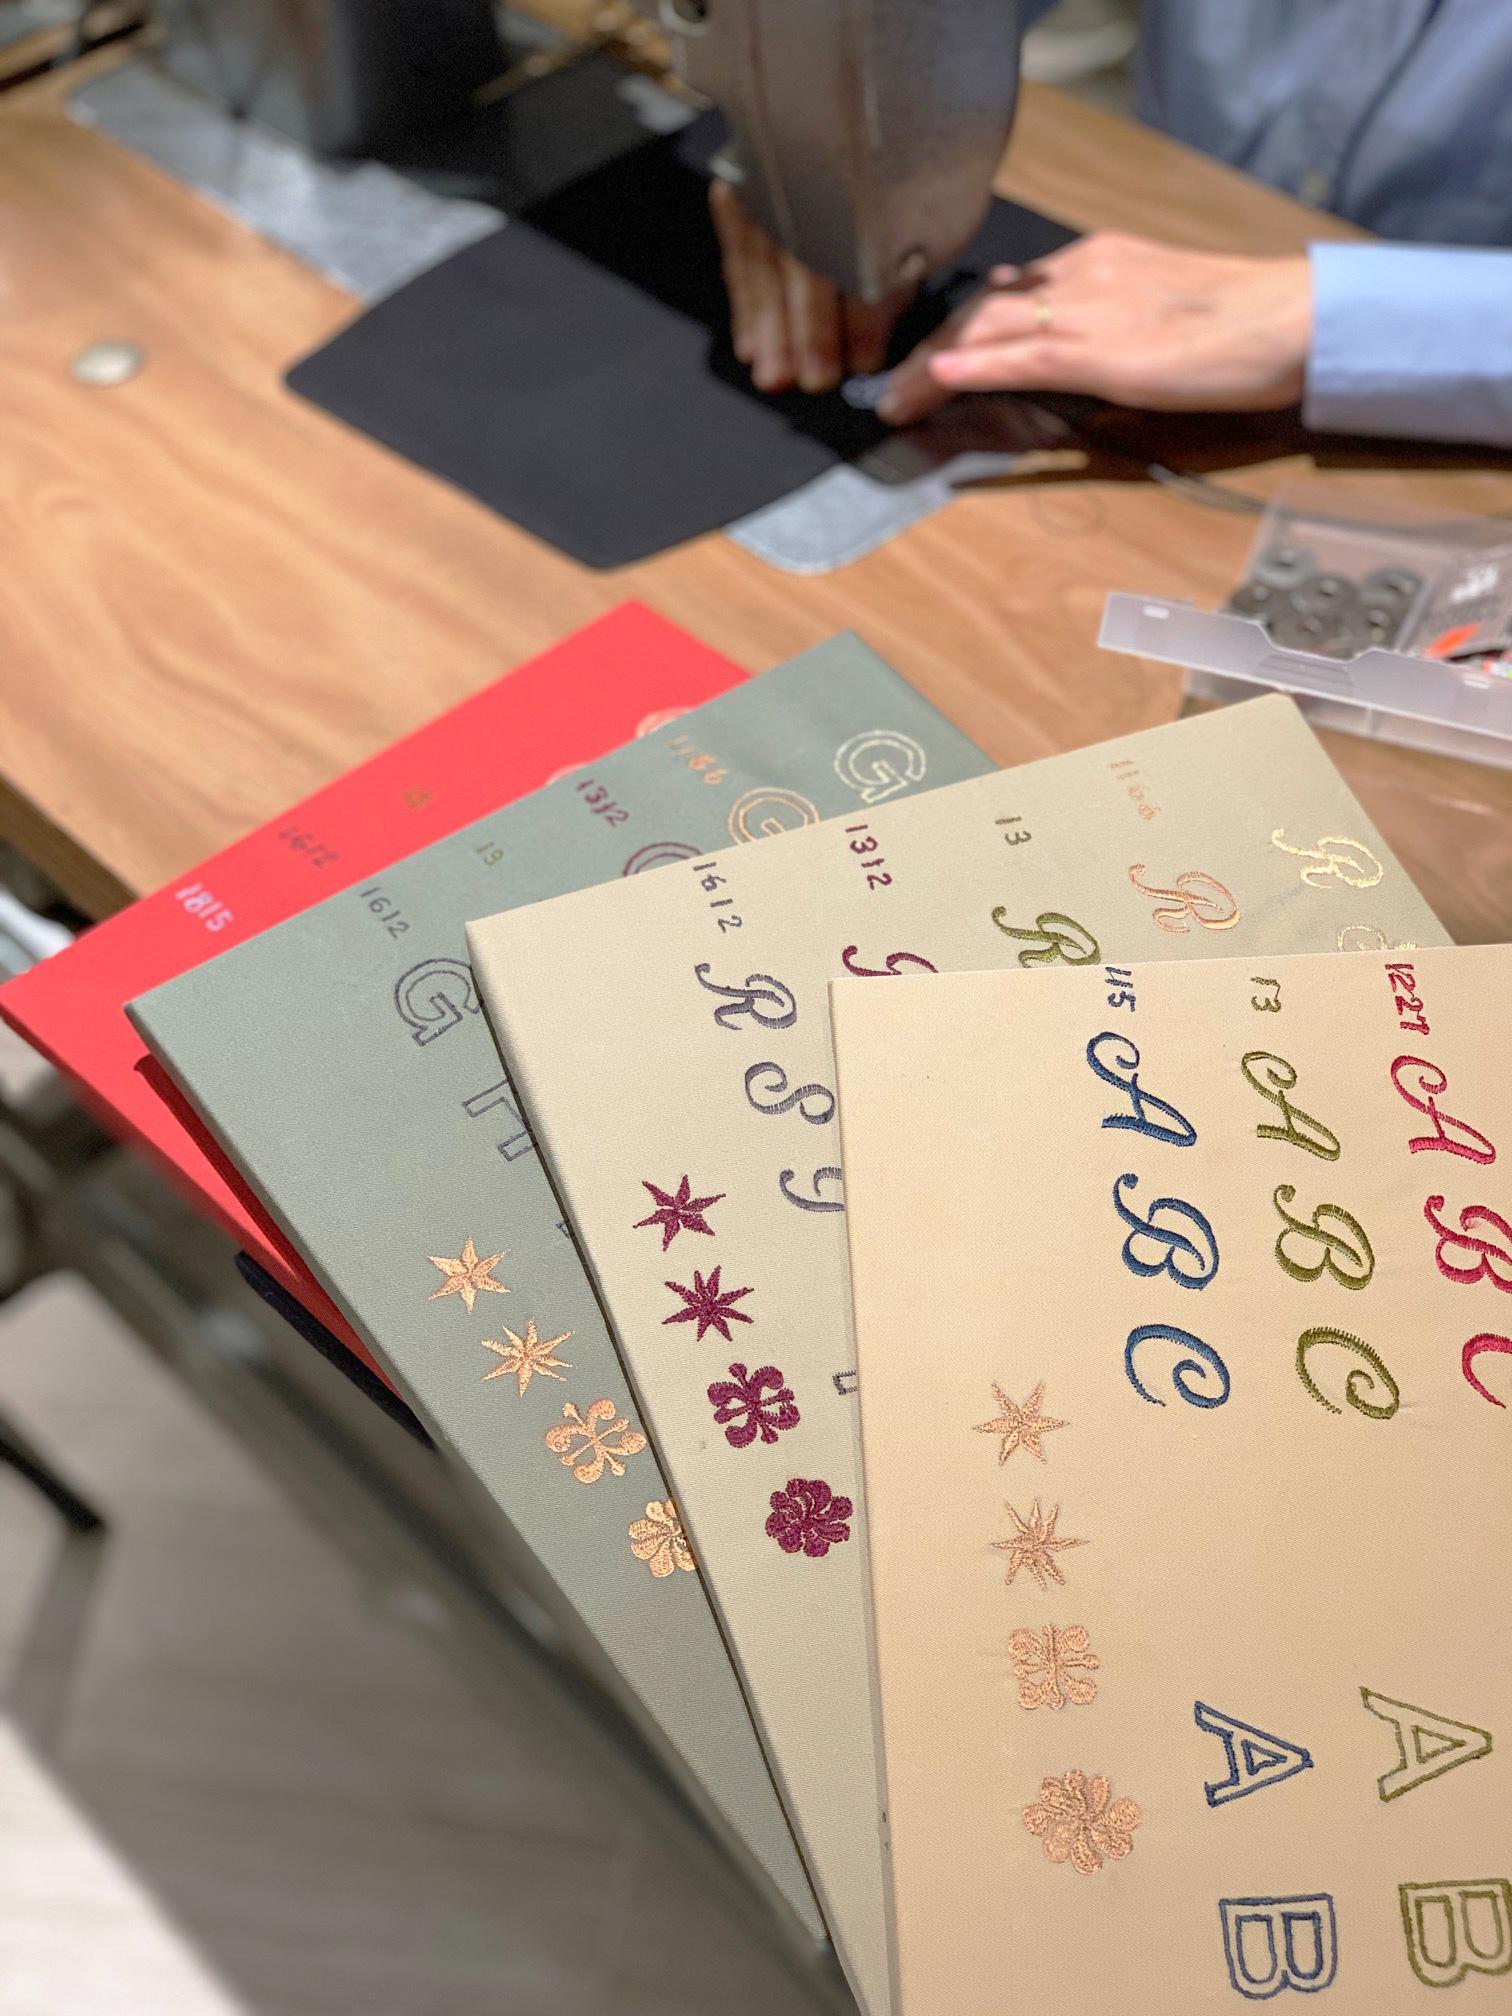 GINZA SIX POP-UP STOREにてカスタム刺繍ができる限定イベントを開催